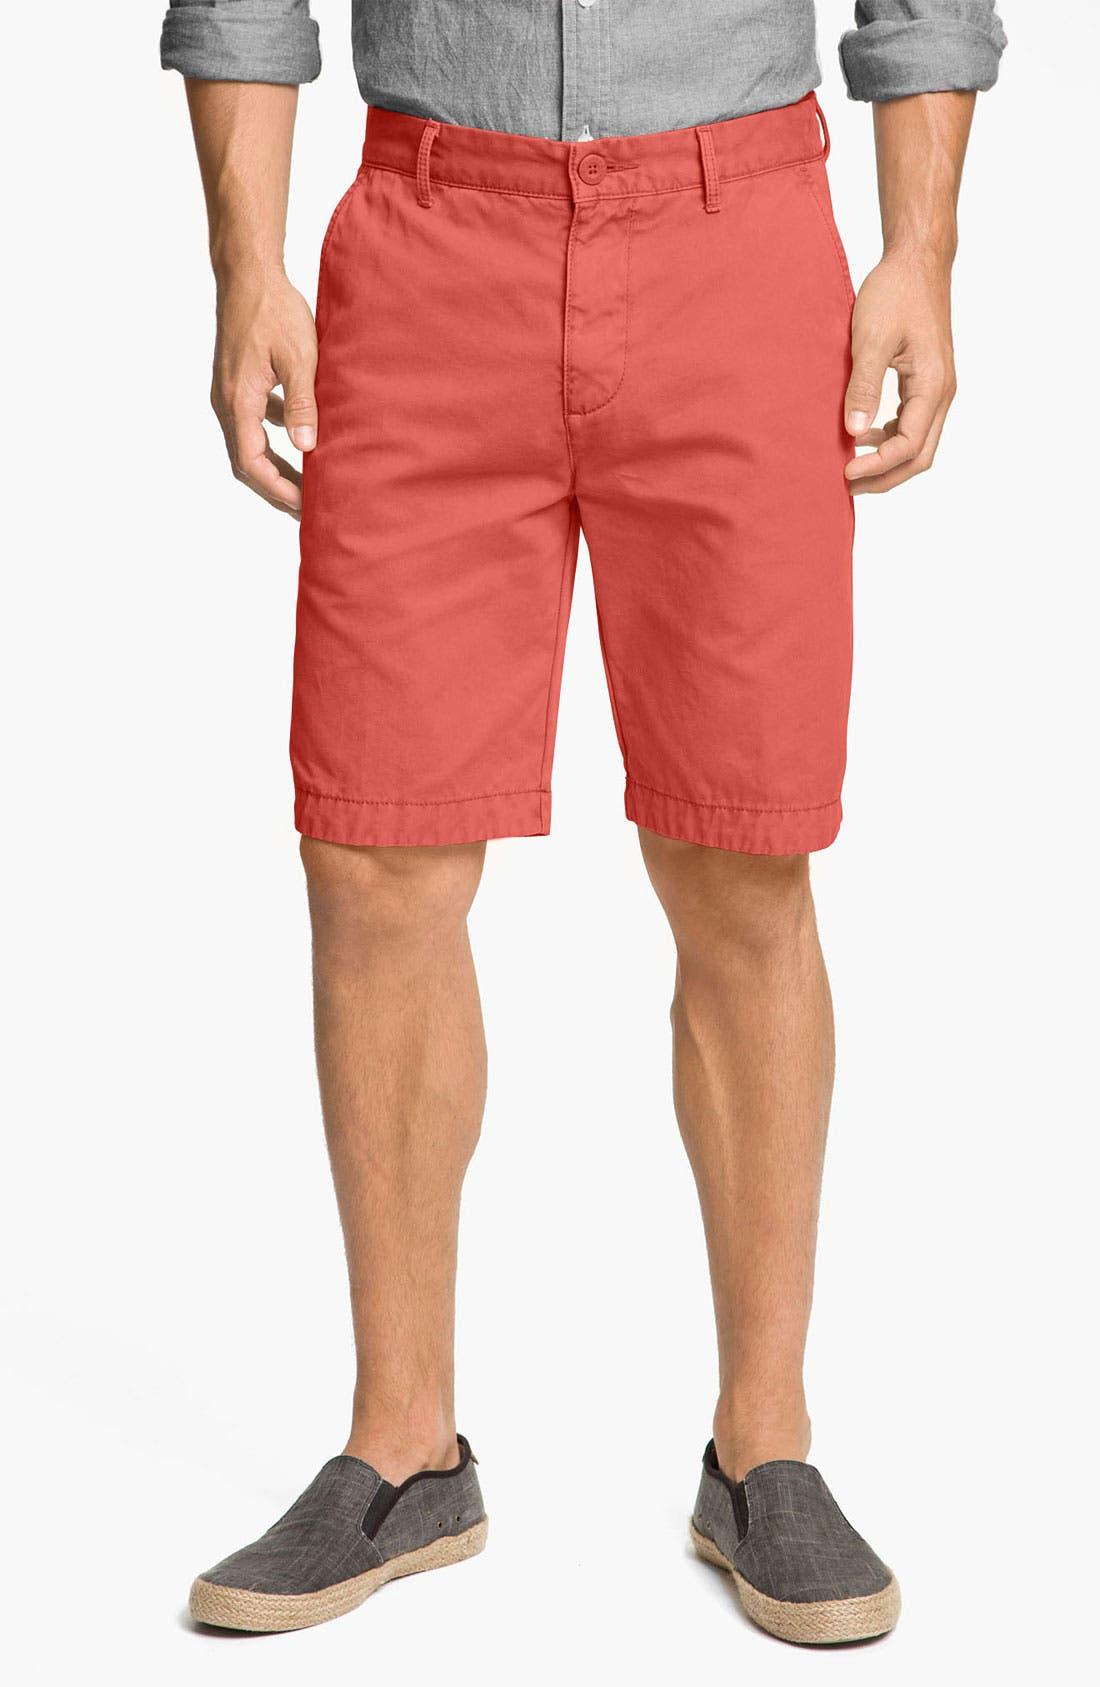 Alternate Image 1 Selected - Halsey 44 'Prep' Flat Front Shorts